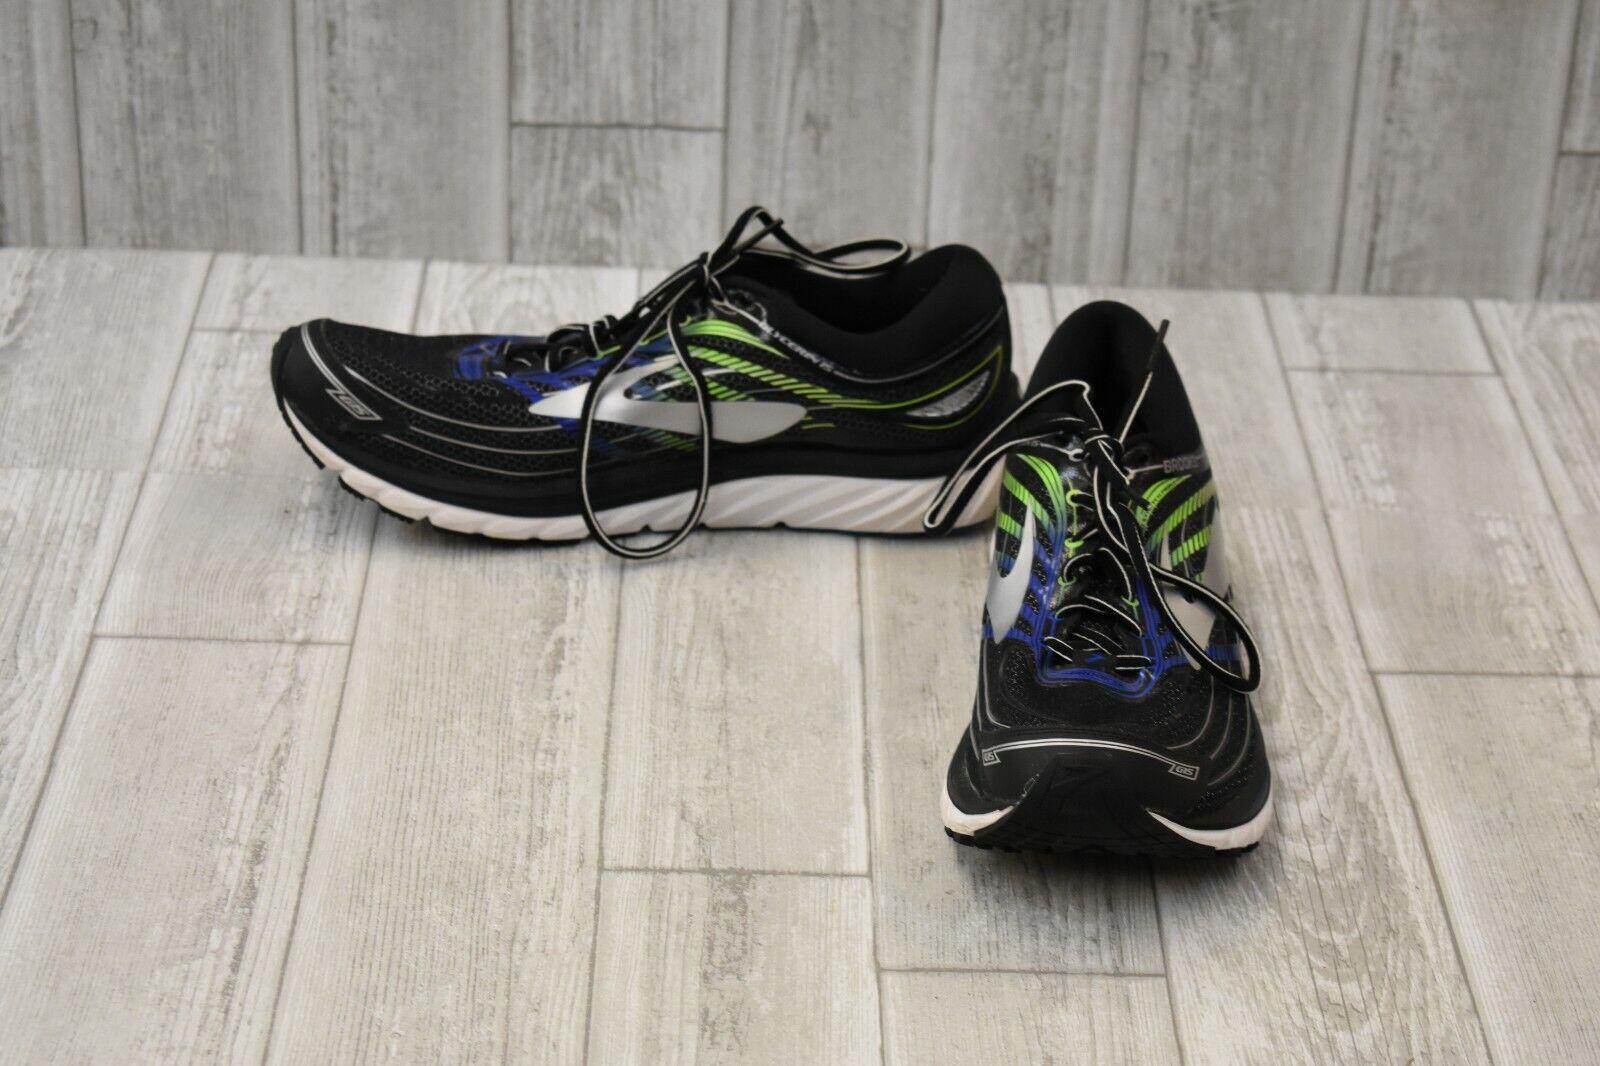 Brooks Glicerina 15 Zapatillas, para hombre, tamaño 14 B, Negro